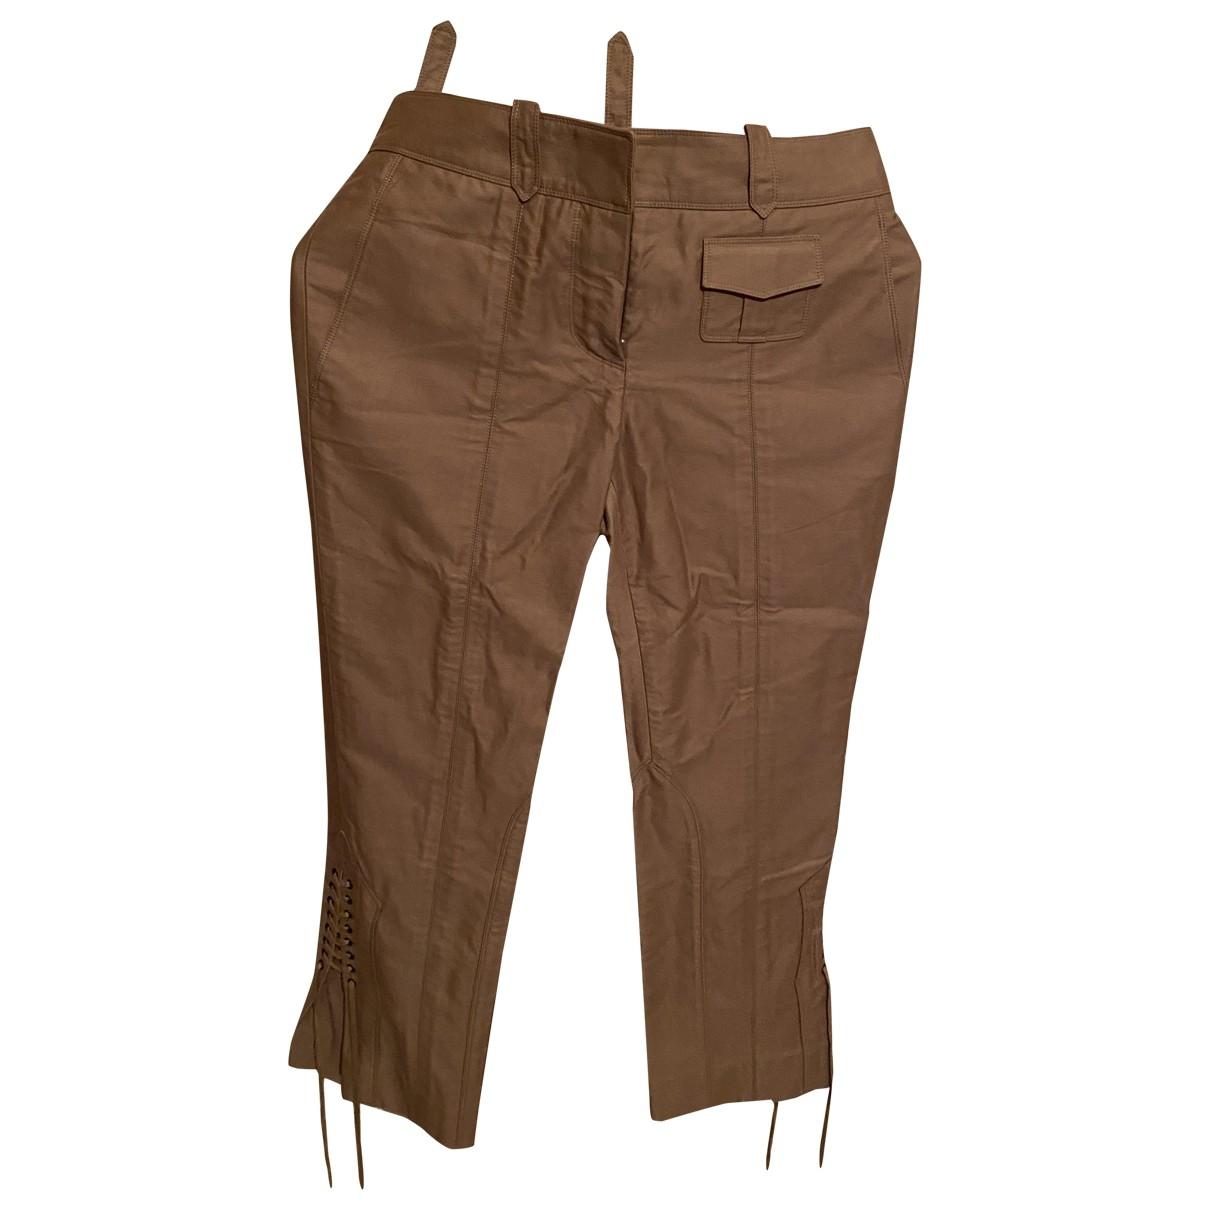 Louis Vuitton \N Beige Cotton Trousers for Women 36 FR